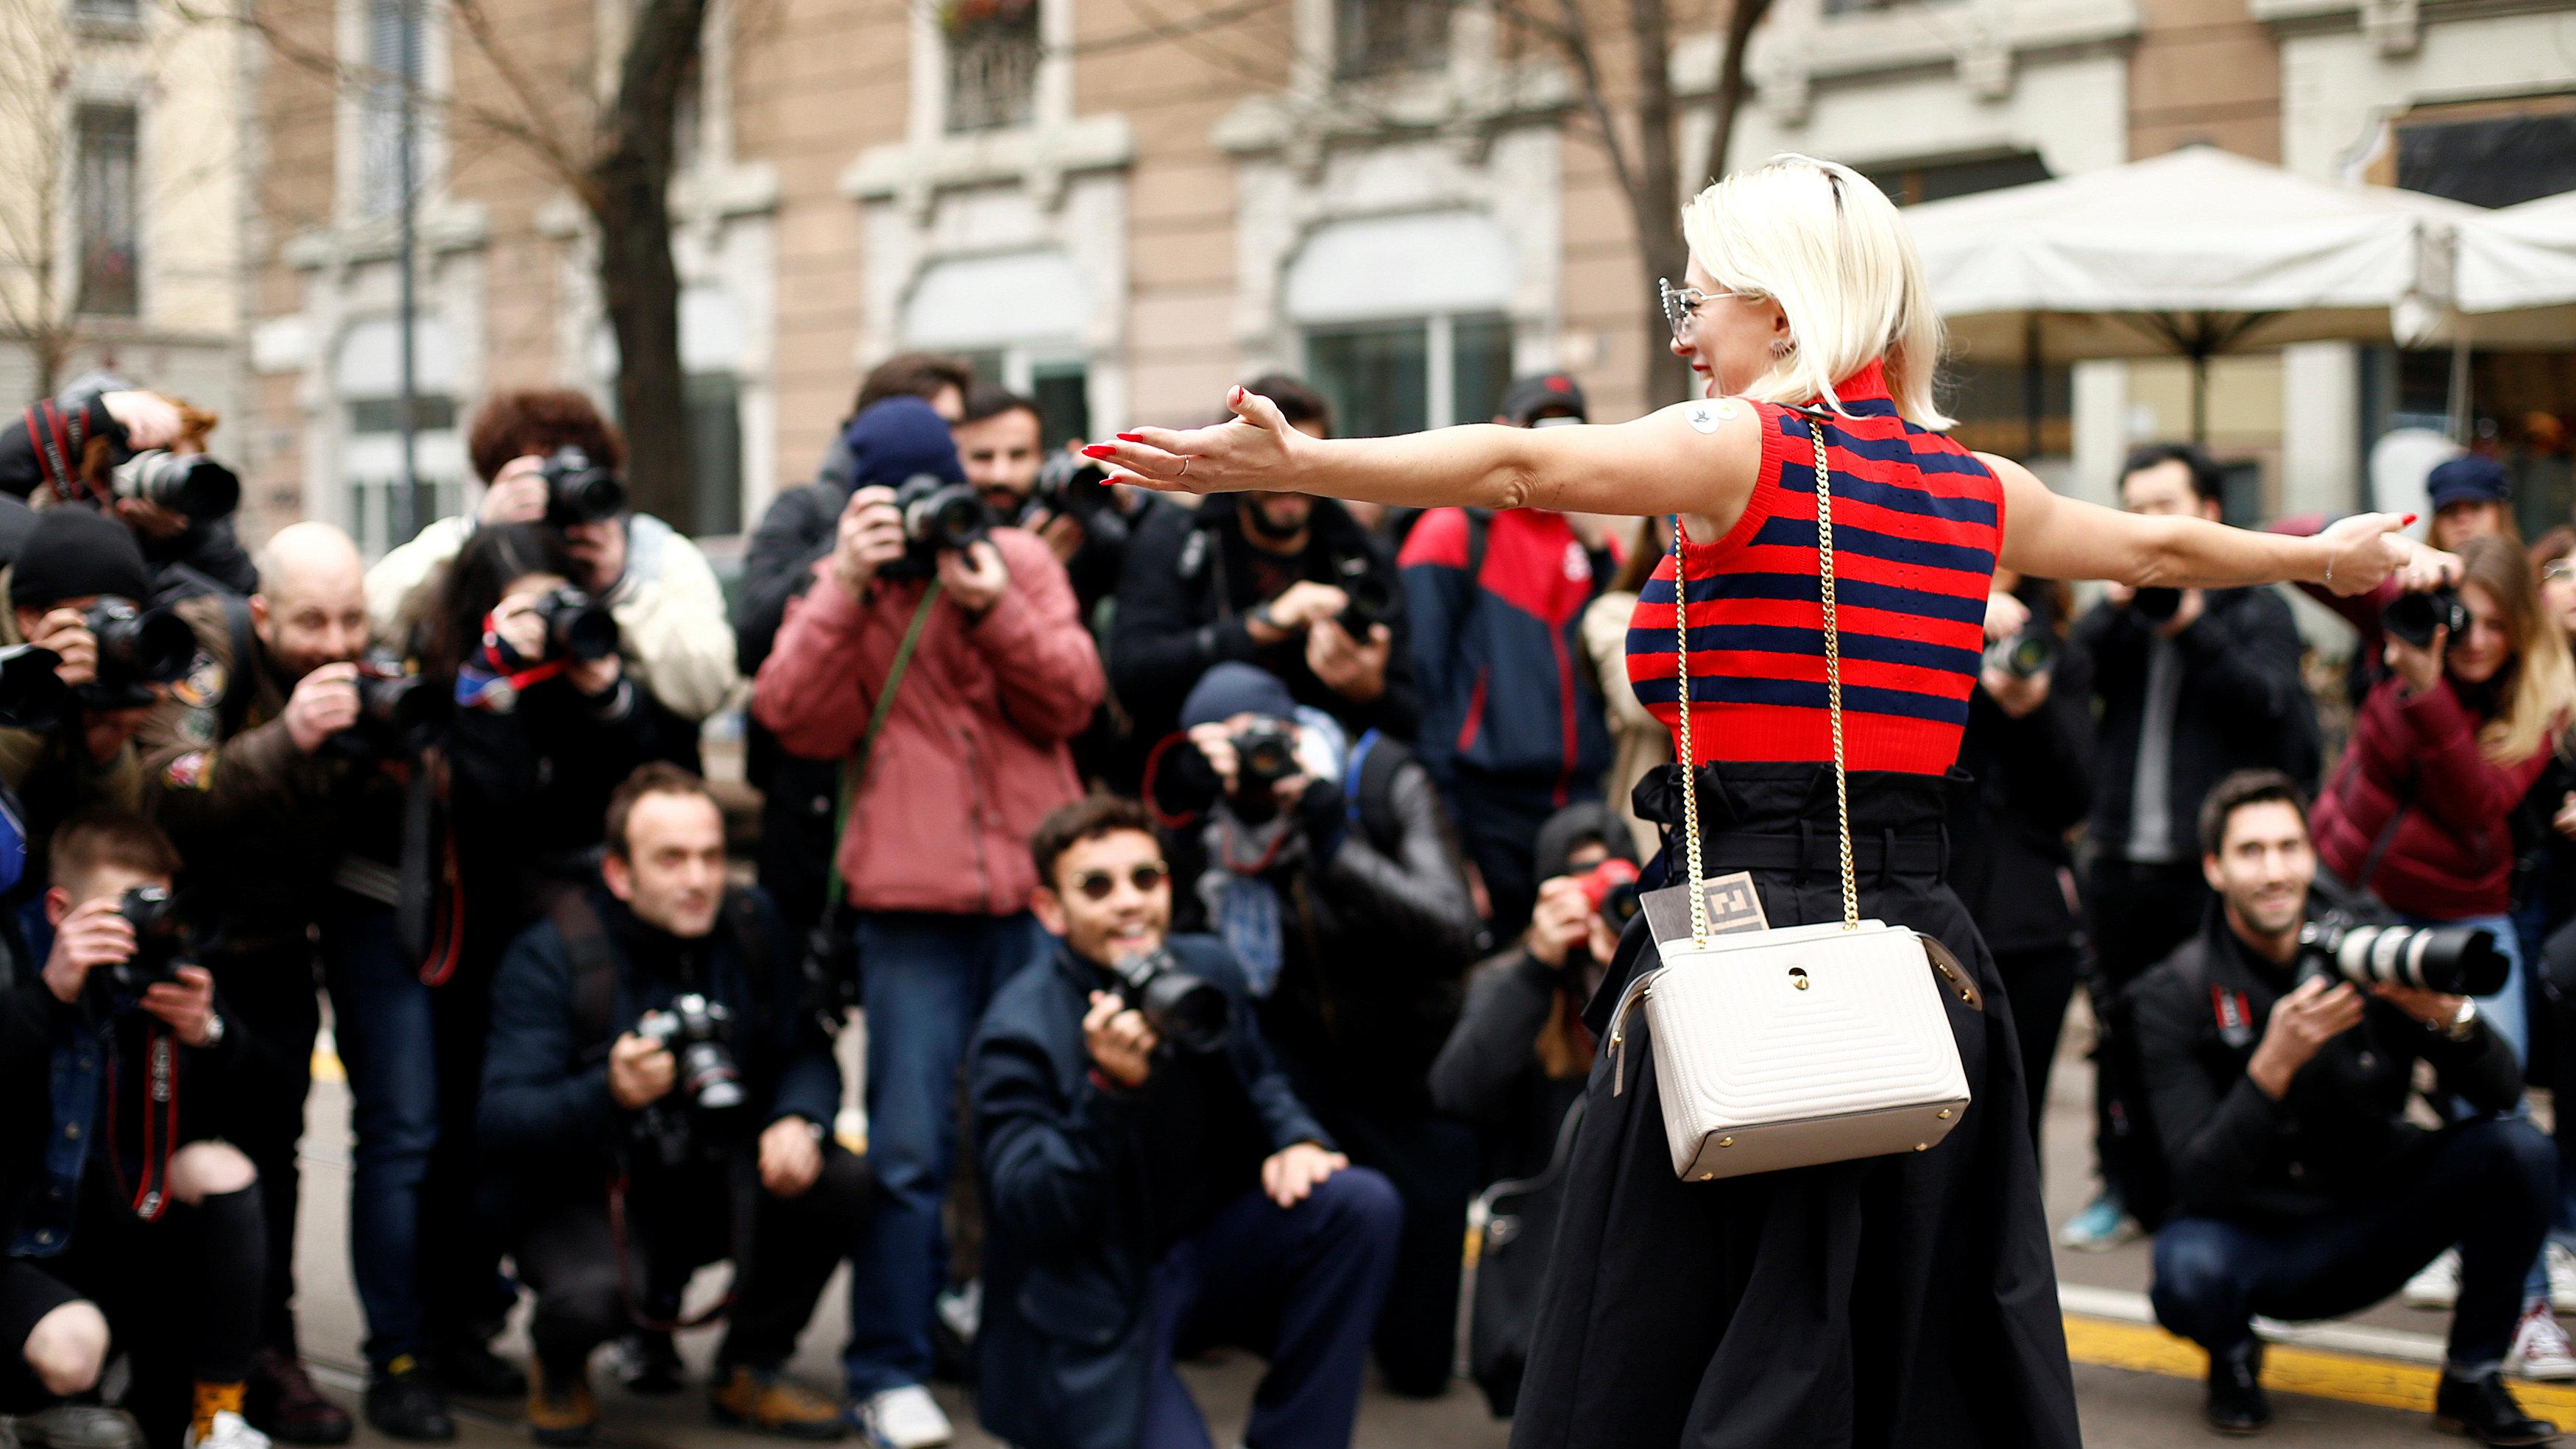 blogger posing for photographers